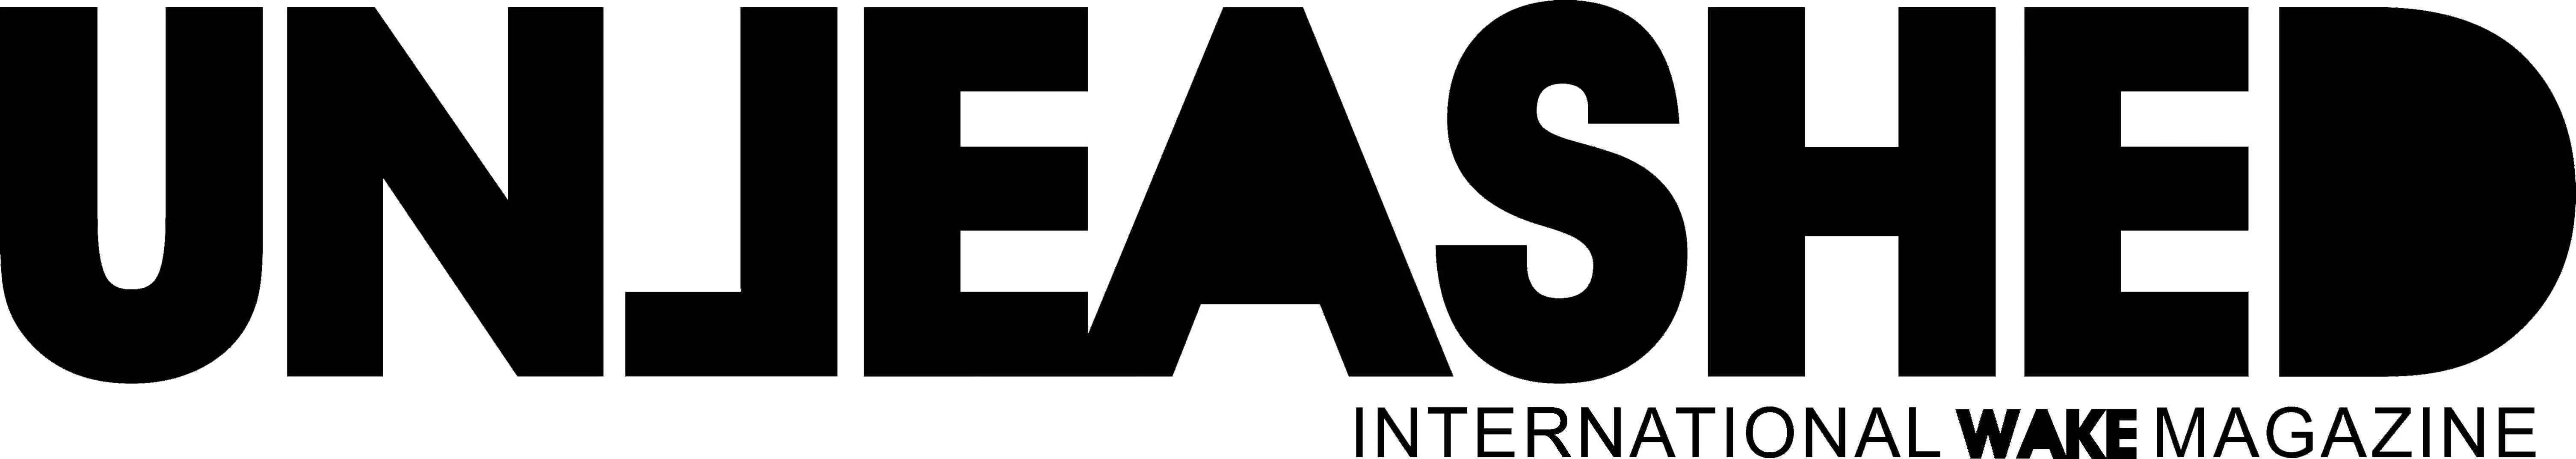 Unleashed-wake-mag-logo-low